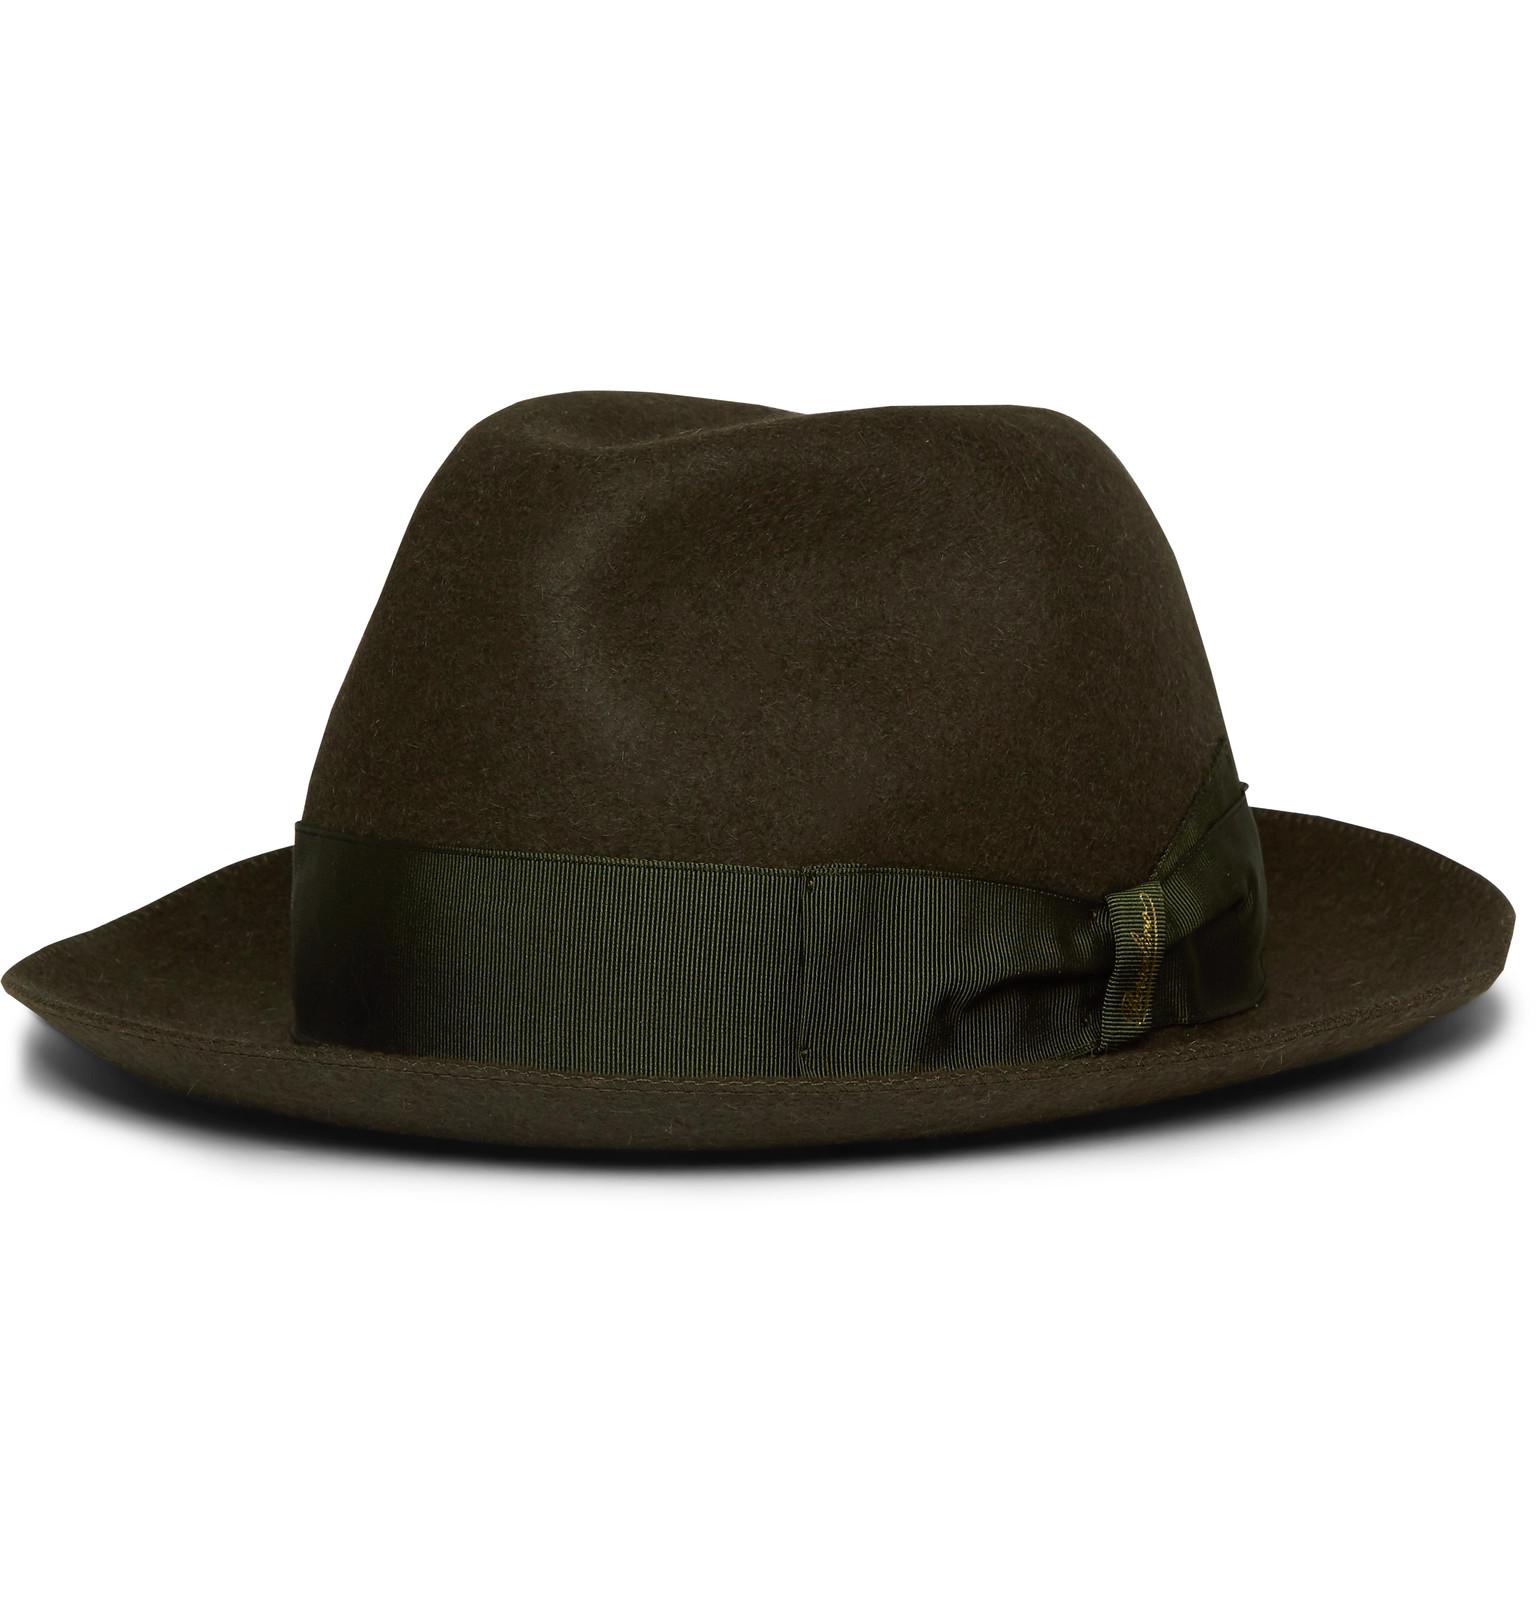 0e4c8efdc65 Borsalino - Traveller Rabbit-Felt Hat